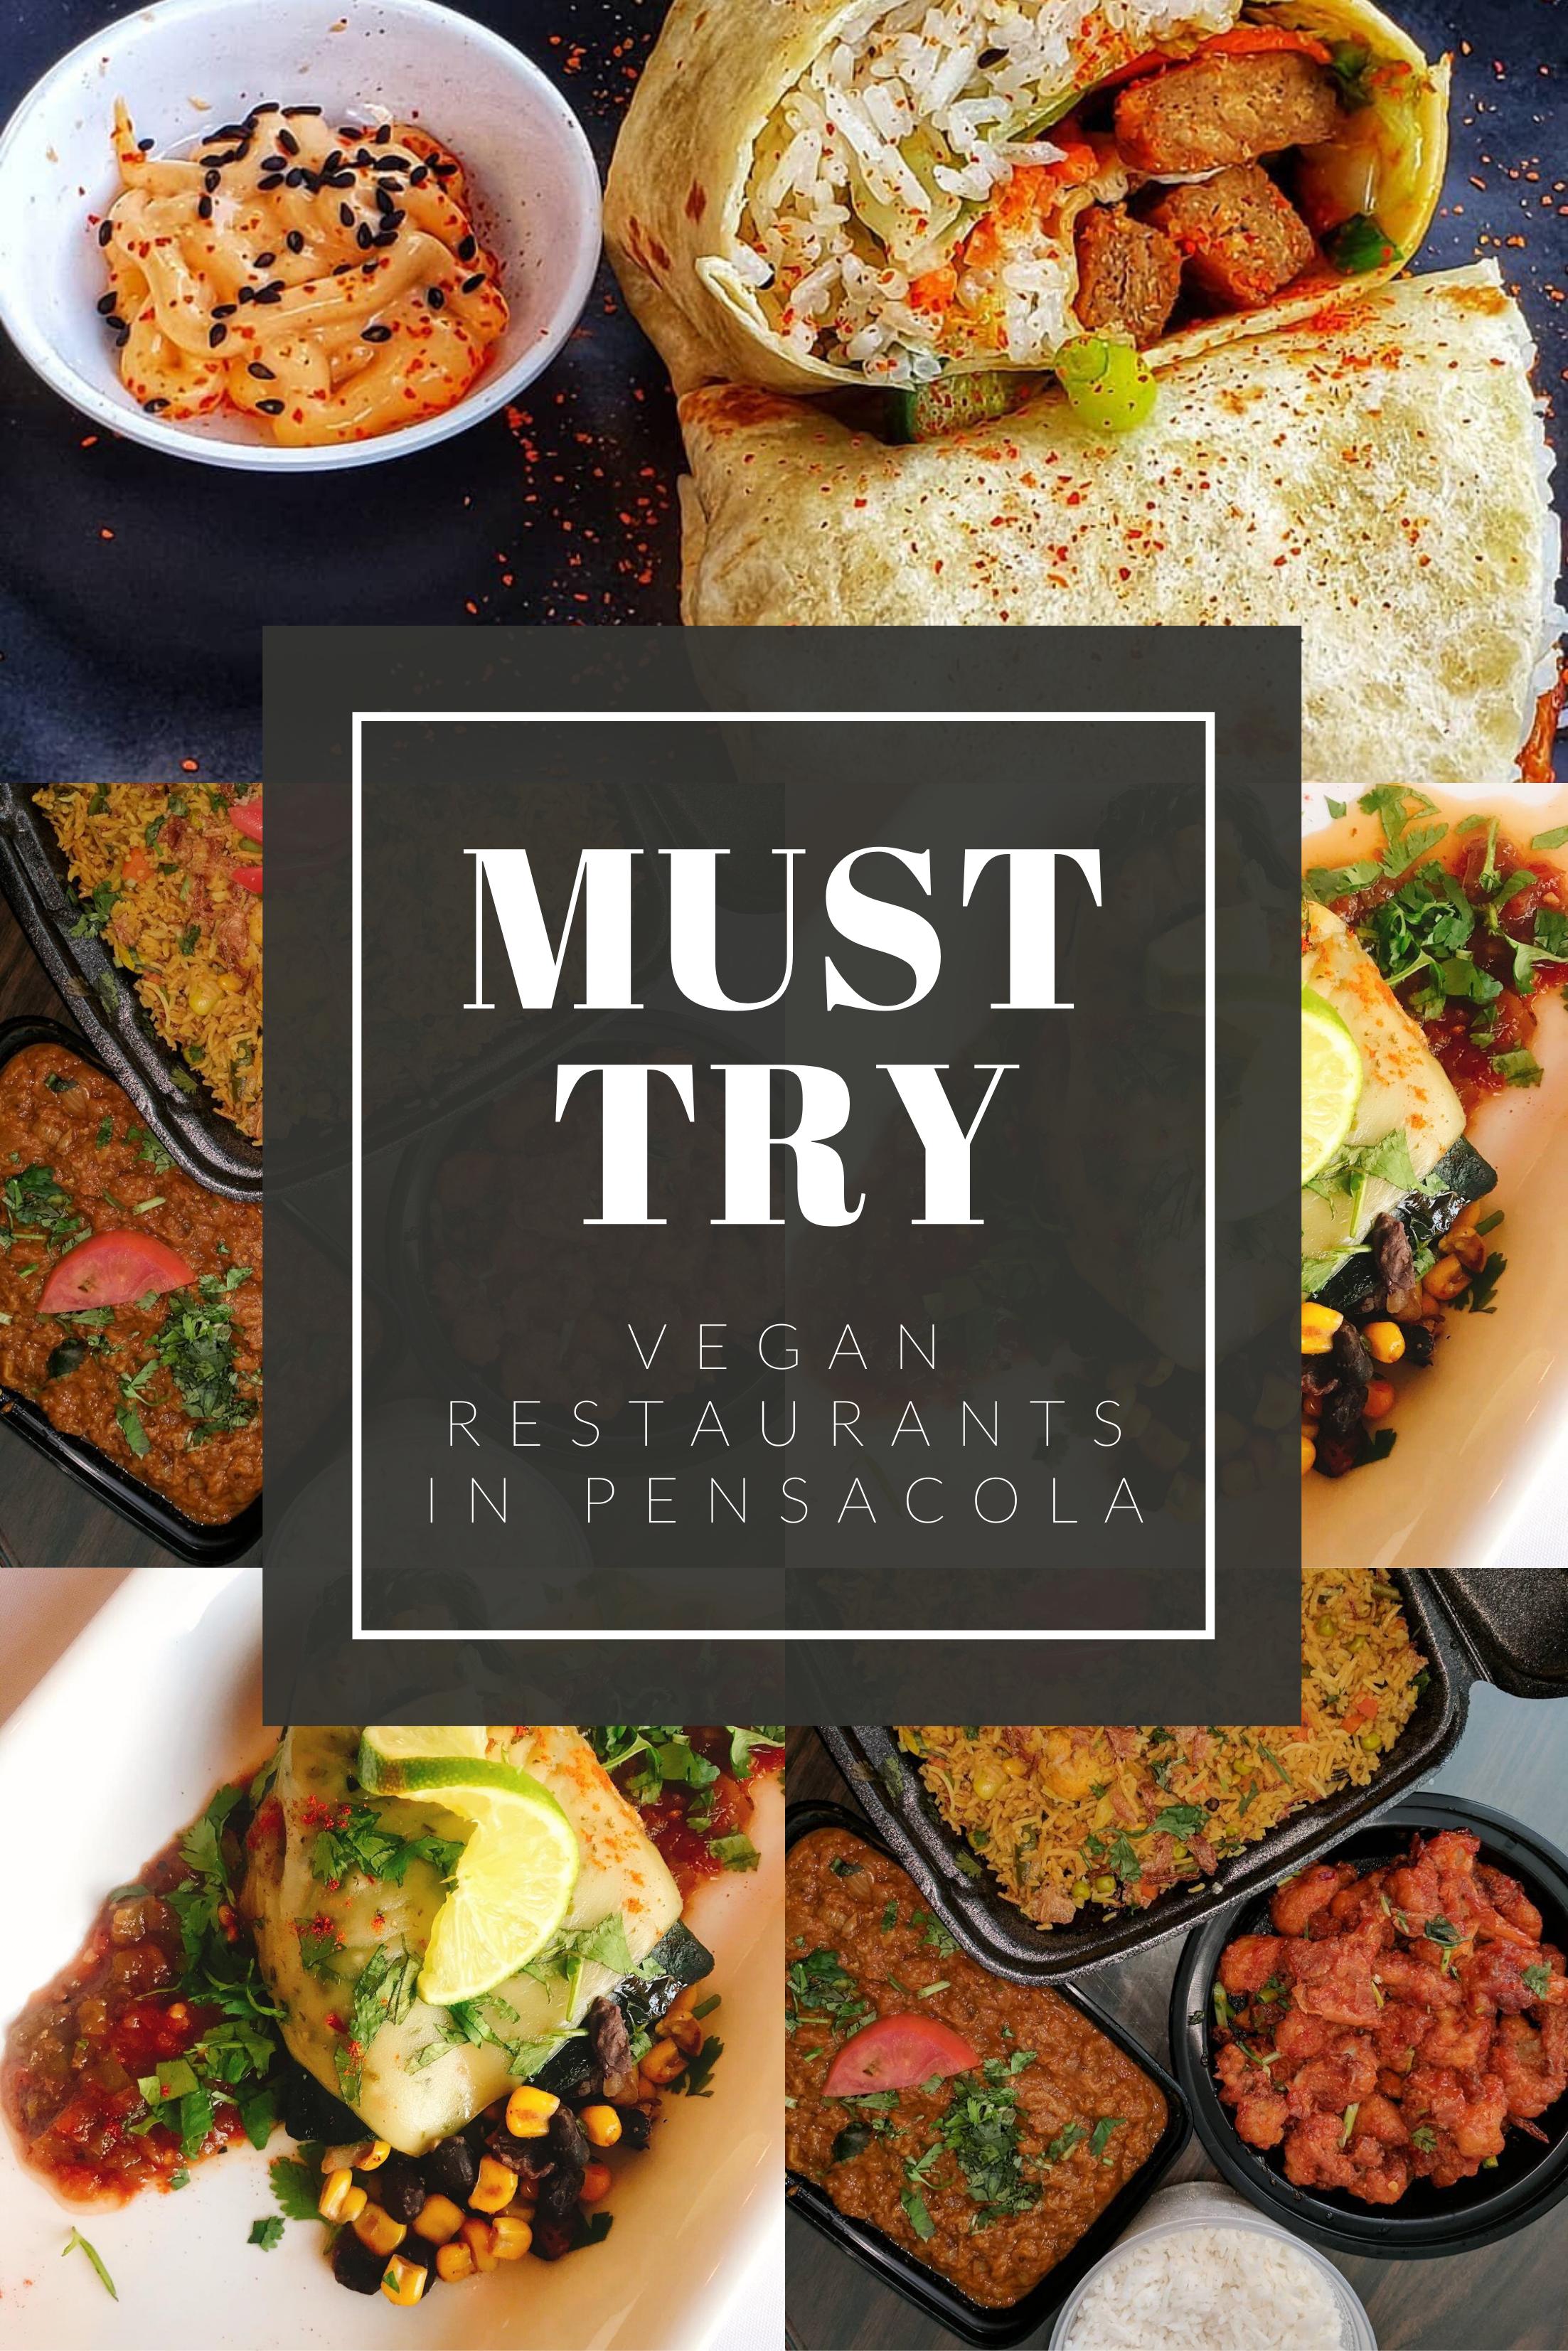 Pensacola S Vegan Treats You Ll Love To Eat Vegan Restaurants Food Critic Vegan Dishes